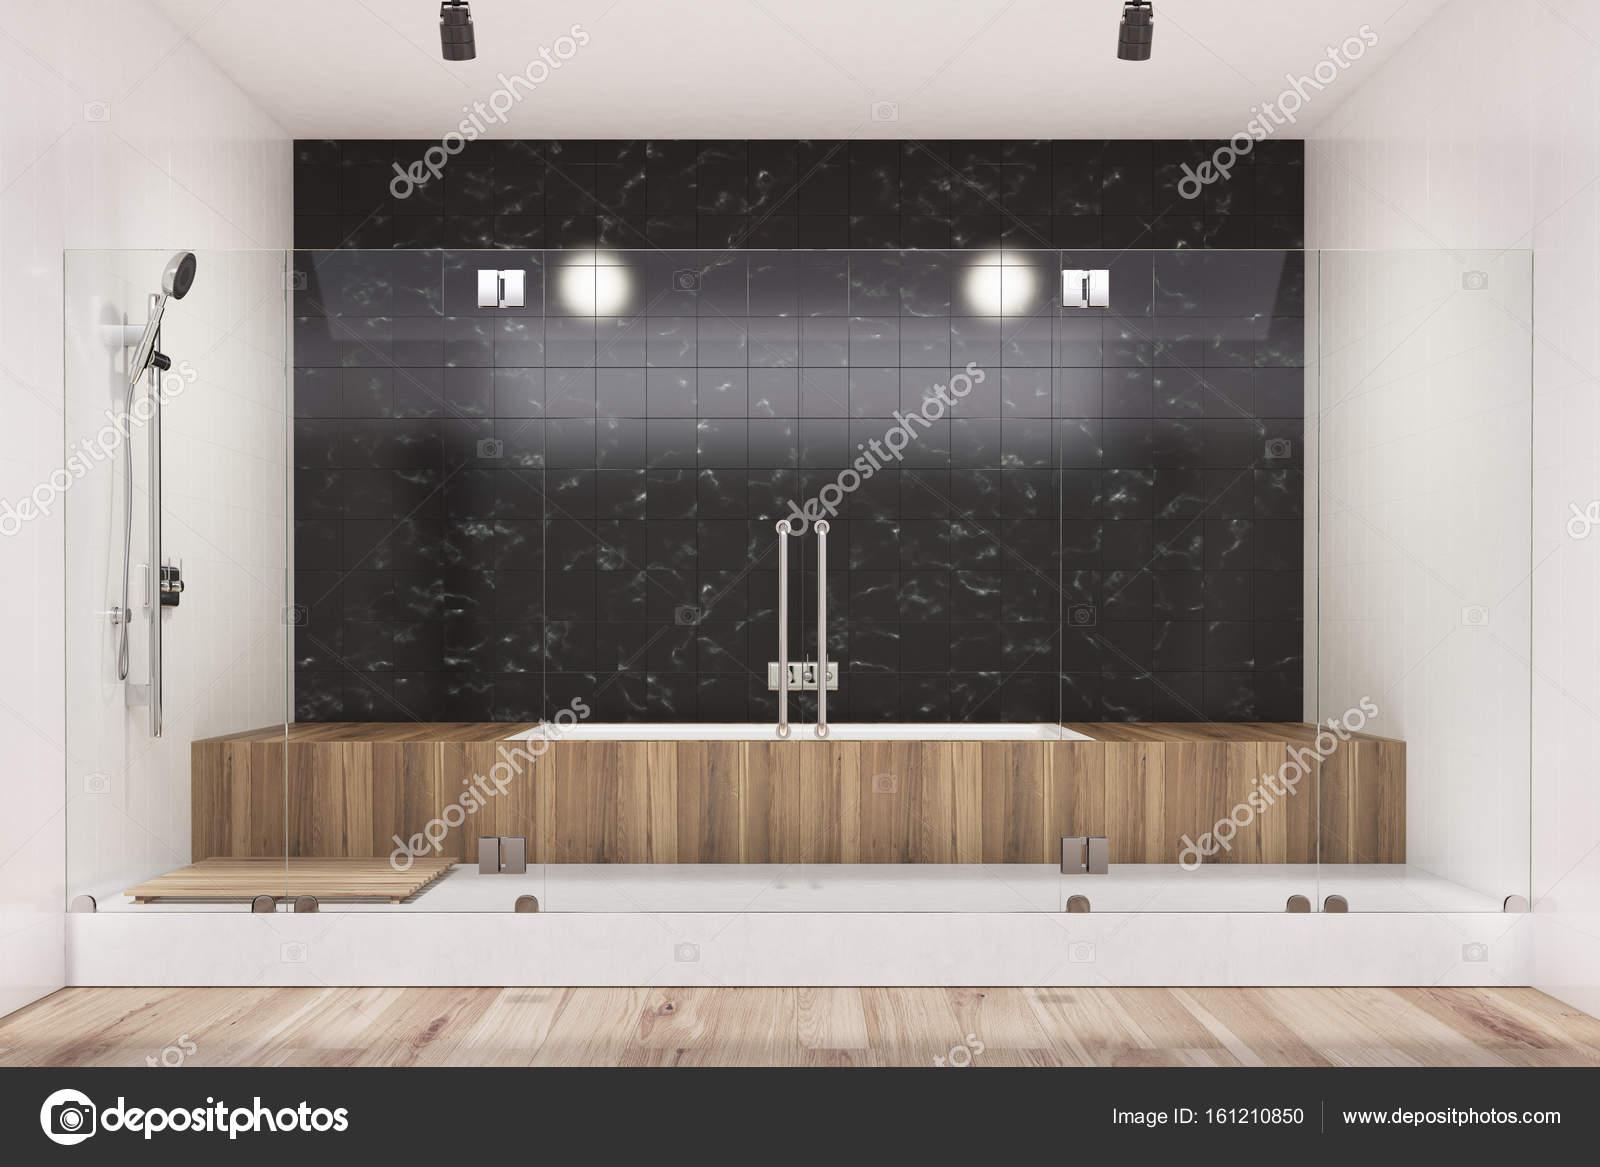 Vasca Da Bagno In Legno : Vasca da bagno nero interni in legno doccia u foto stock